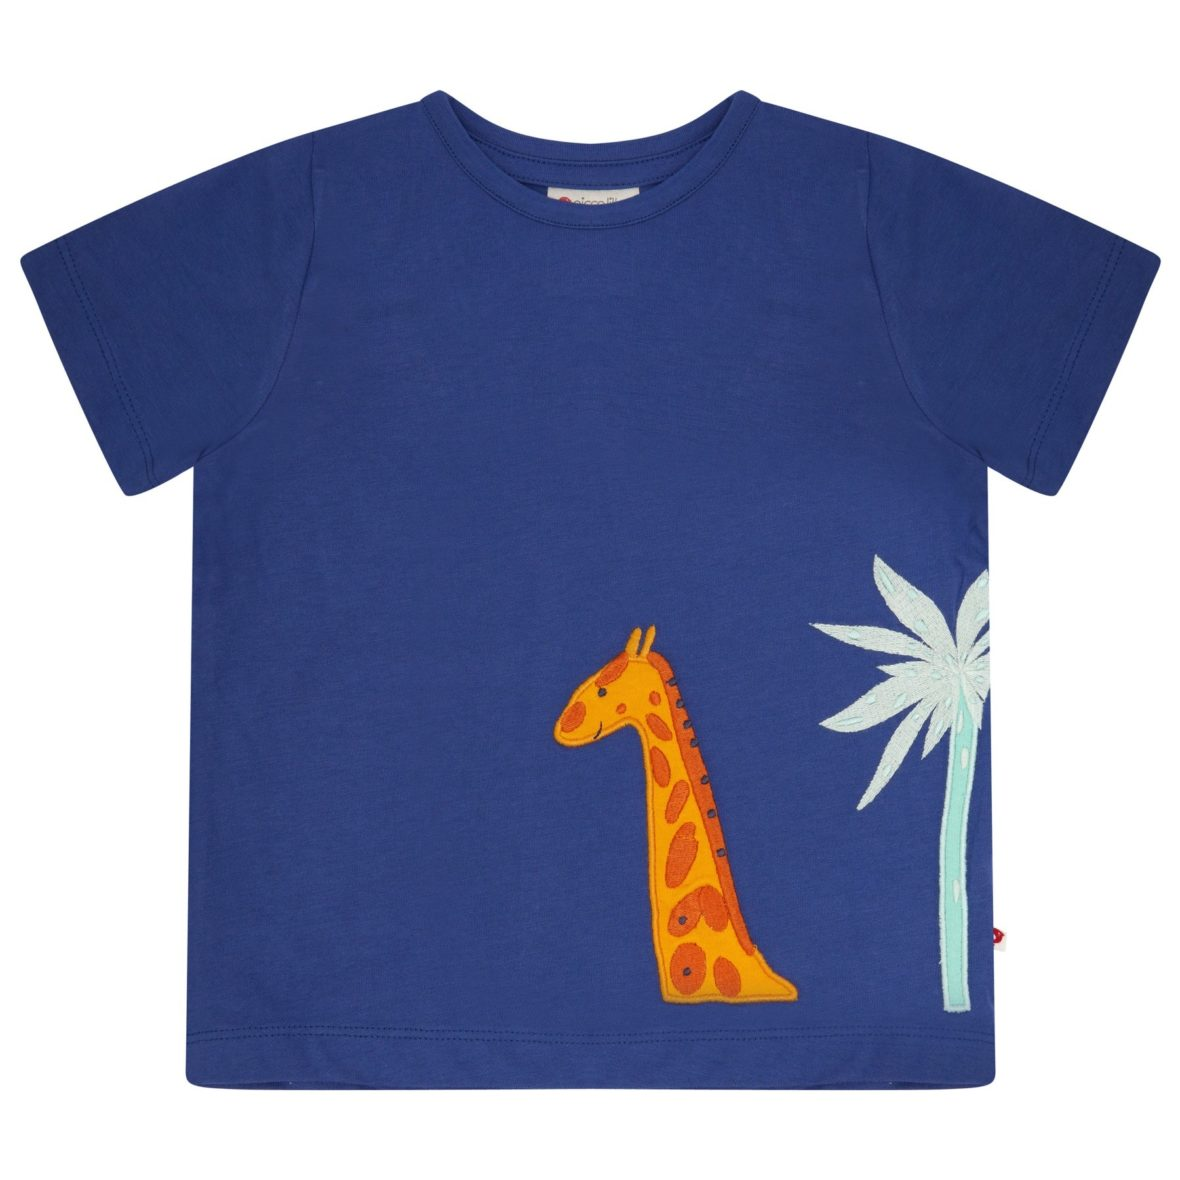 Piccalilly t-shirt Giraffe